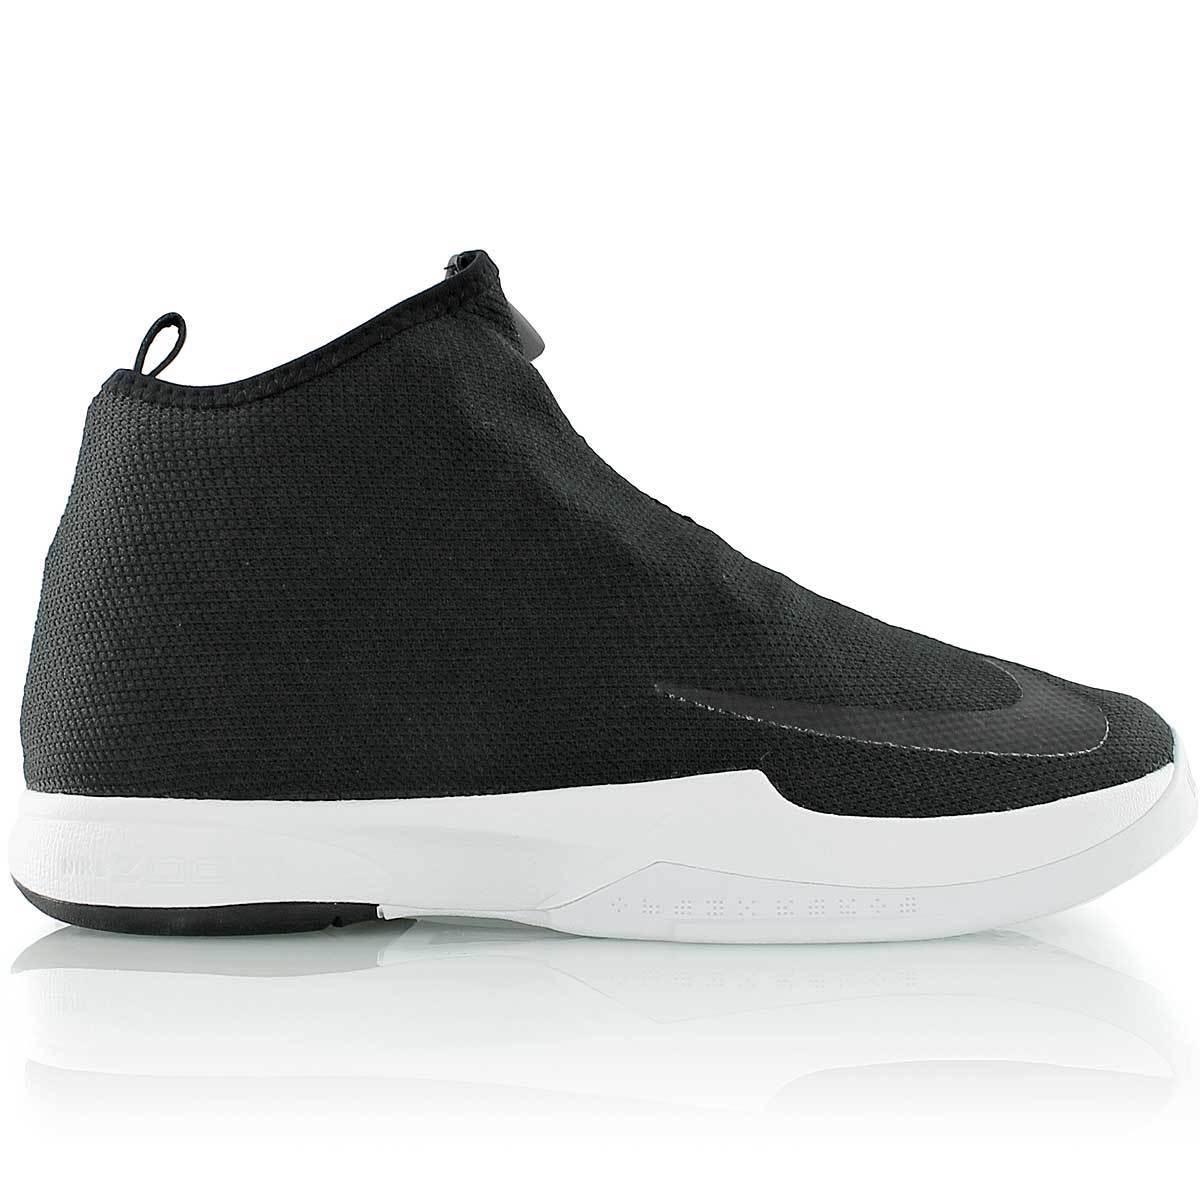 Nike Zoom Kobe Icon Uomo Basketball Shoes Nero / Nero-White SKU 818583-001